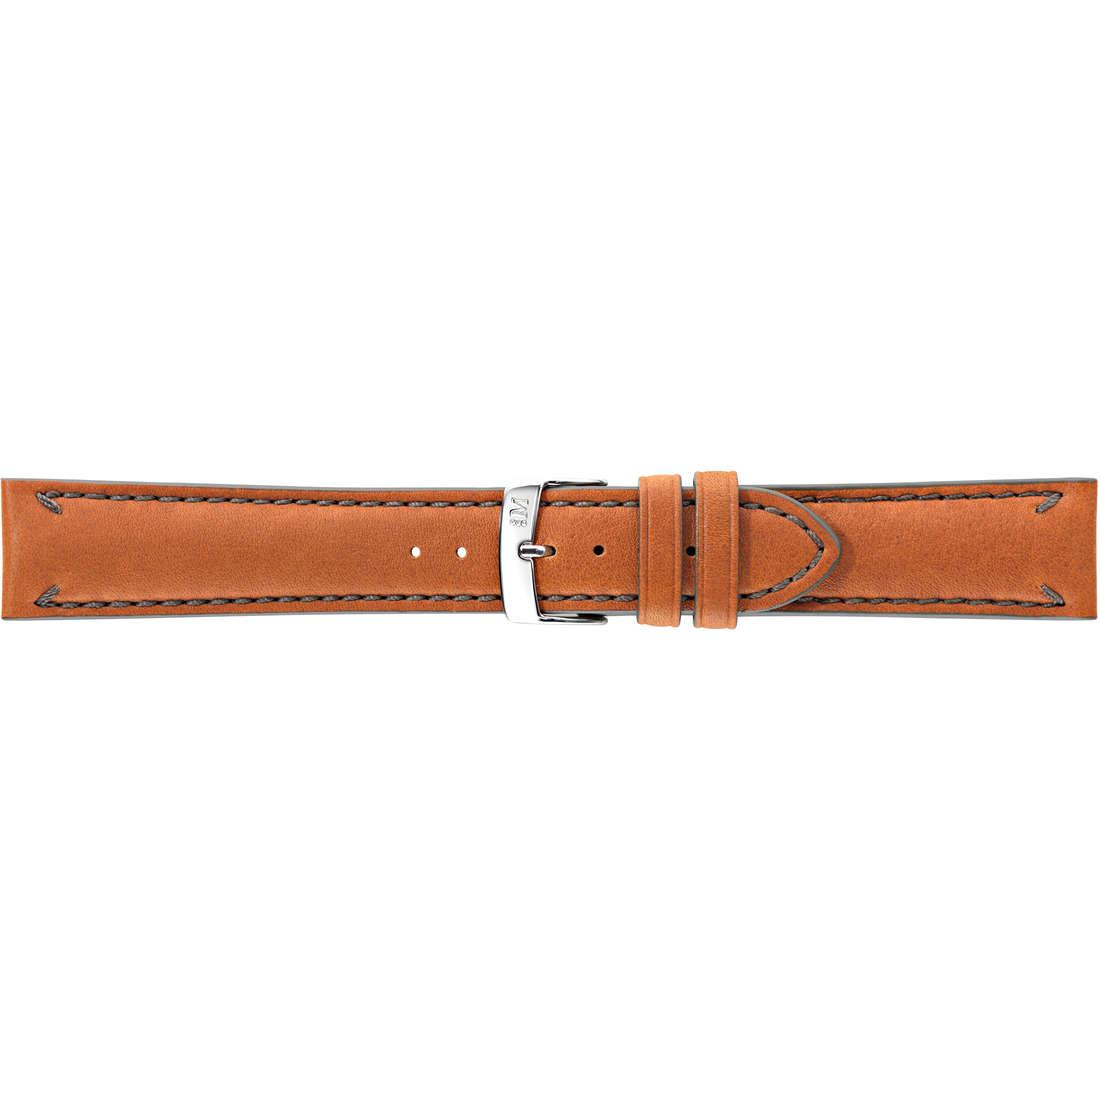 montre bande de montres homme Morellato Manufatti A01X4540A61044CR20